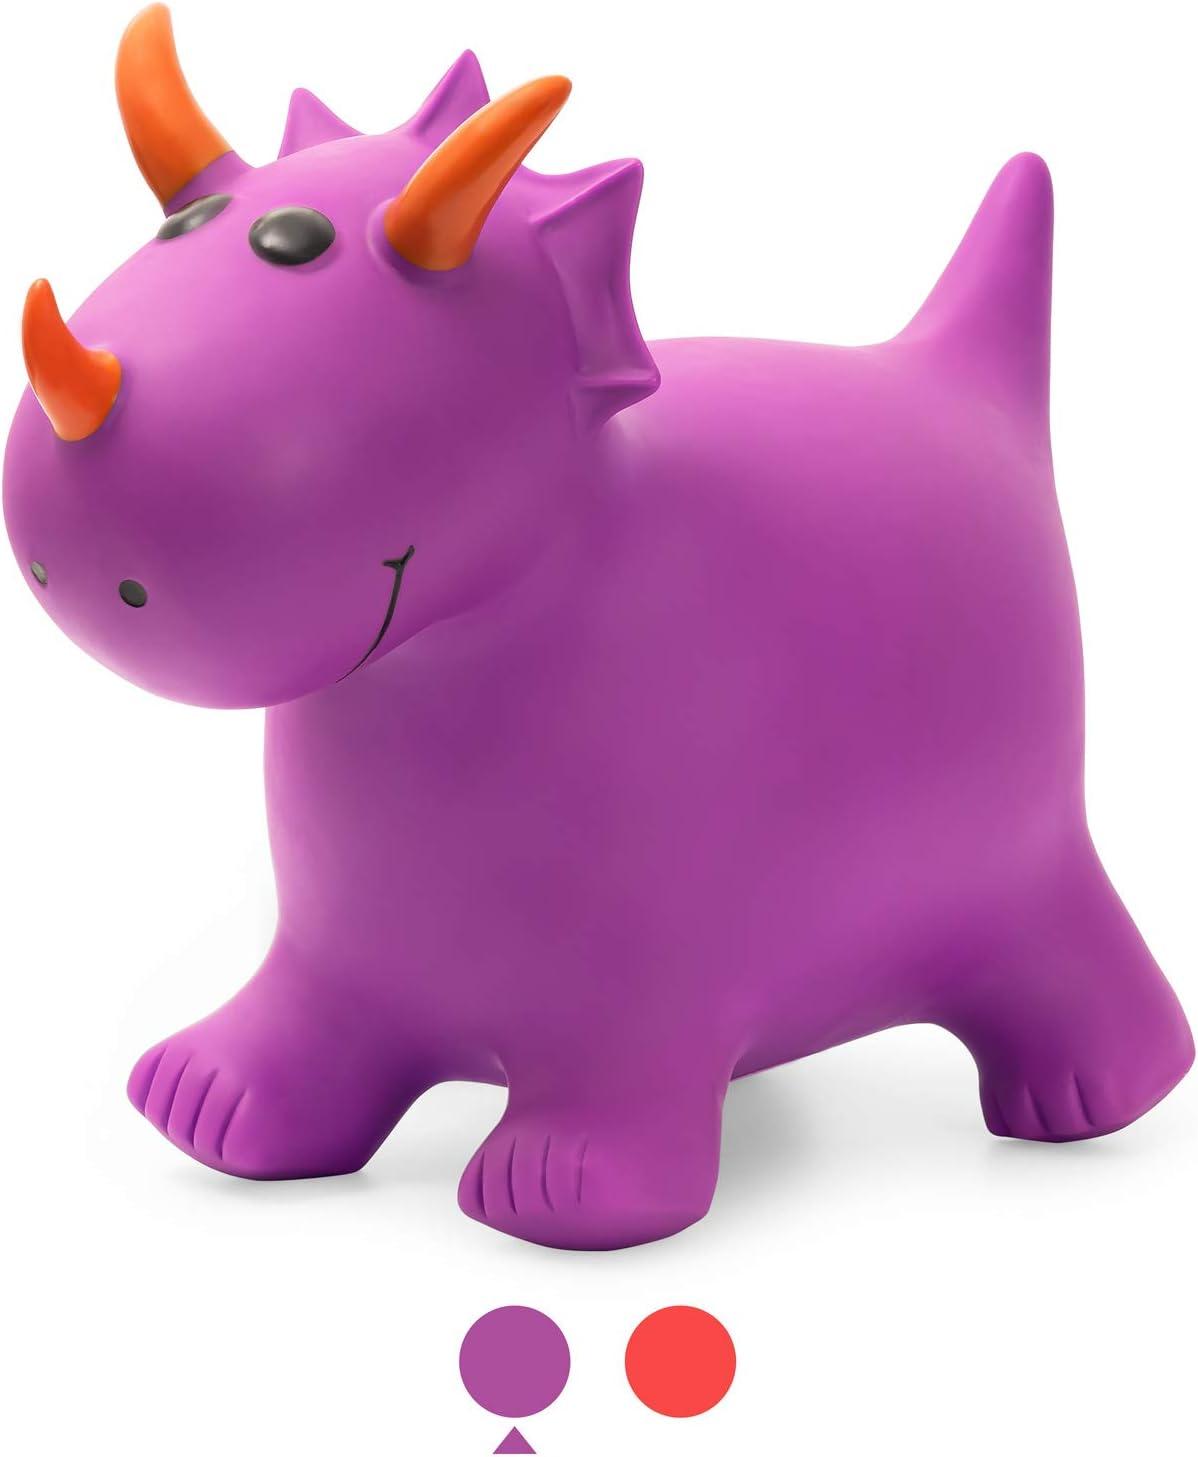 ROBUD Dinosaur Bouncy Horse Hopper, Inflatable Ride On Toys for